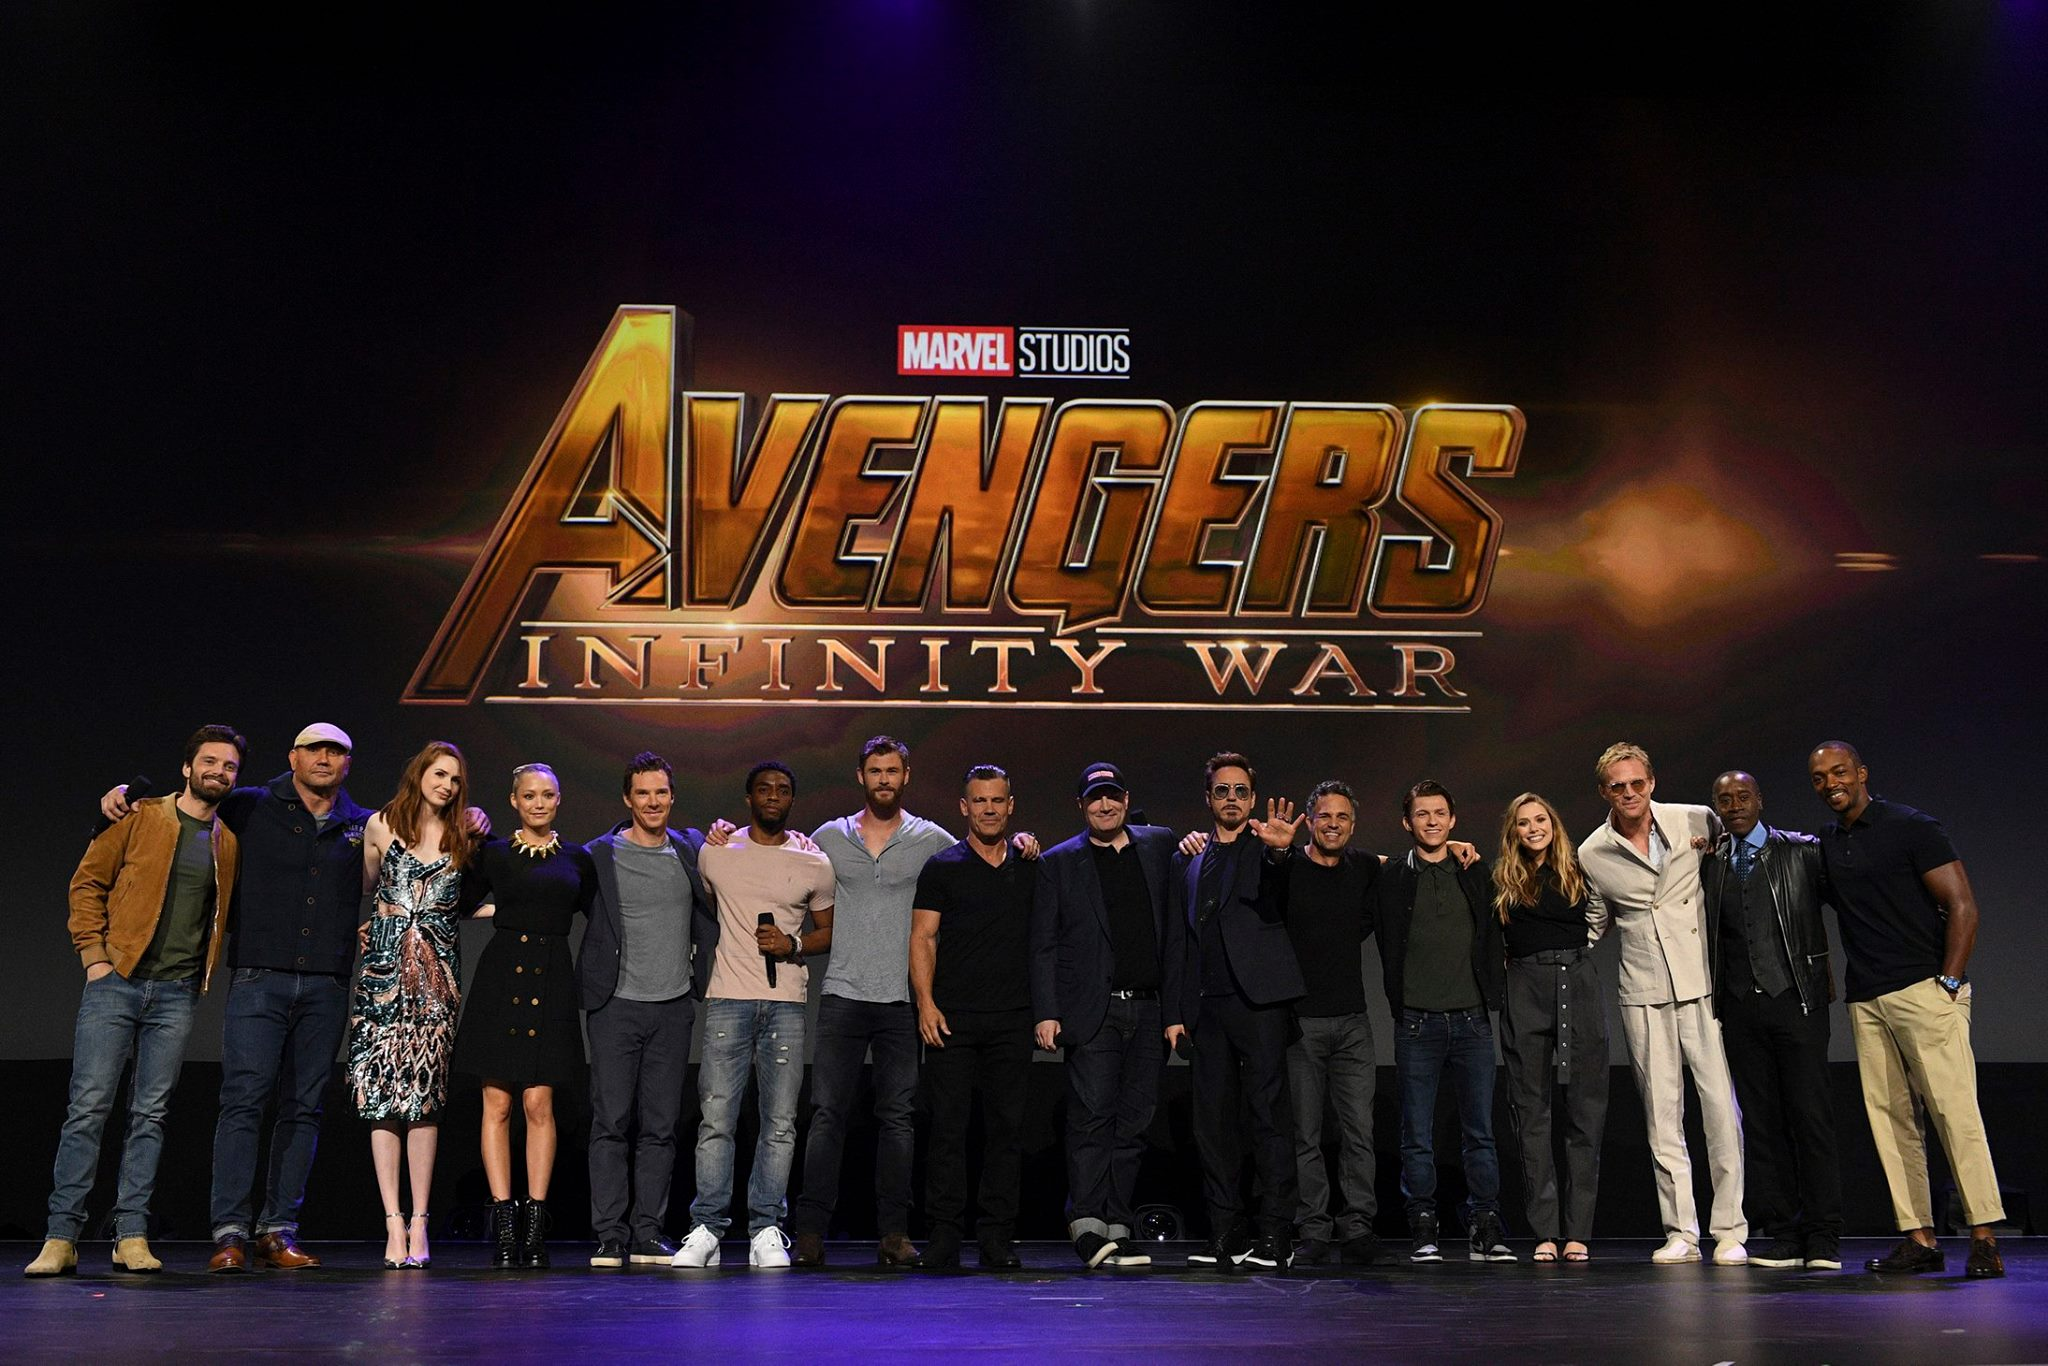 Herci z Avengers: Infinity War pokope na D23